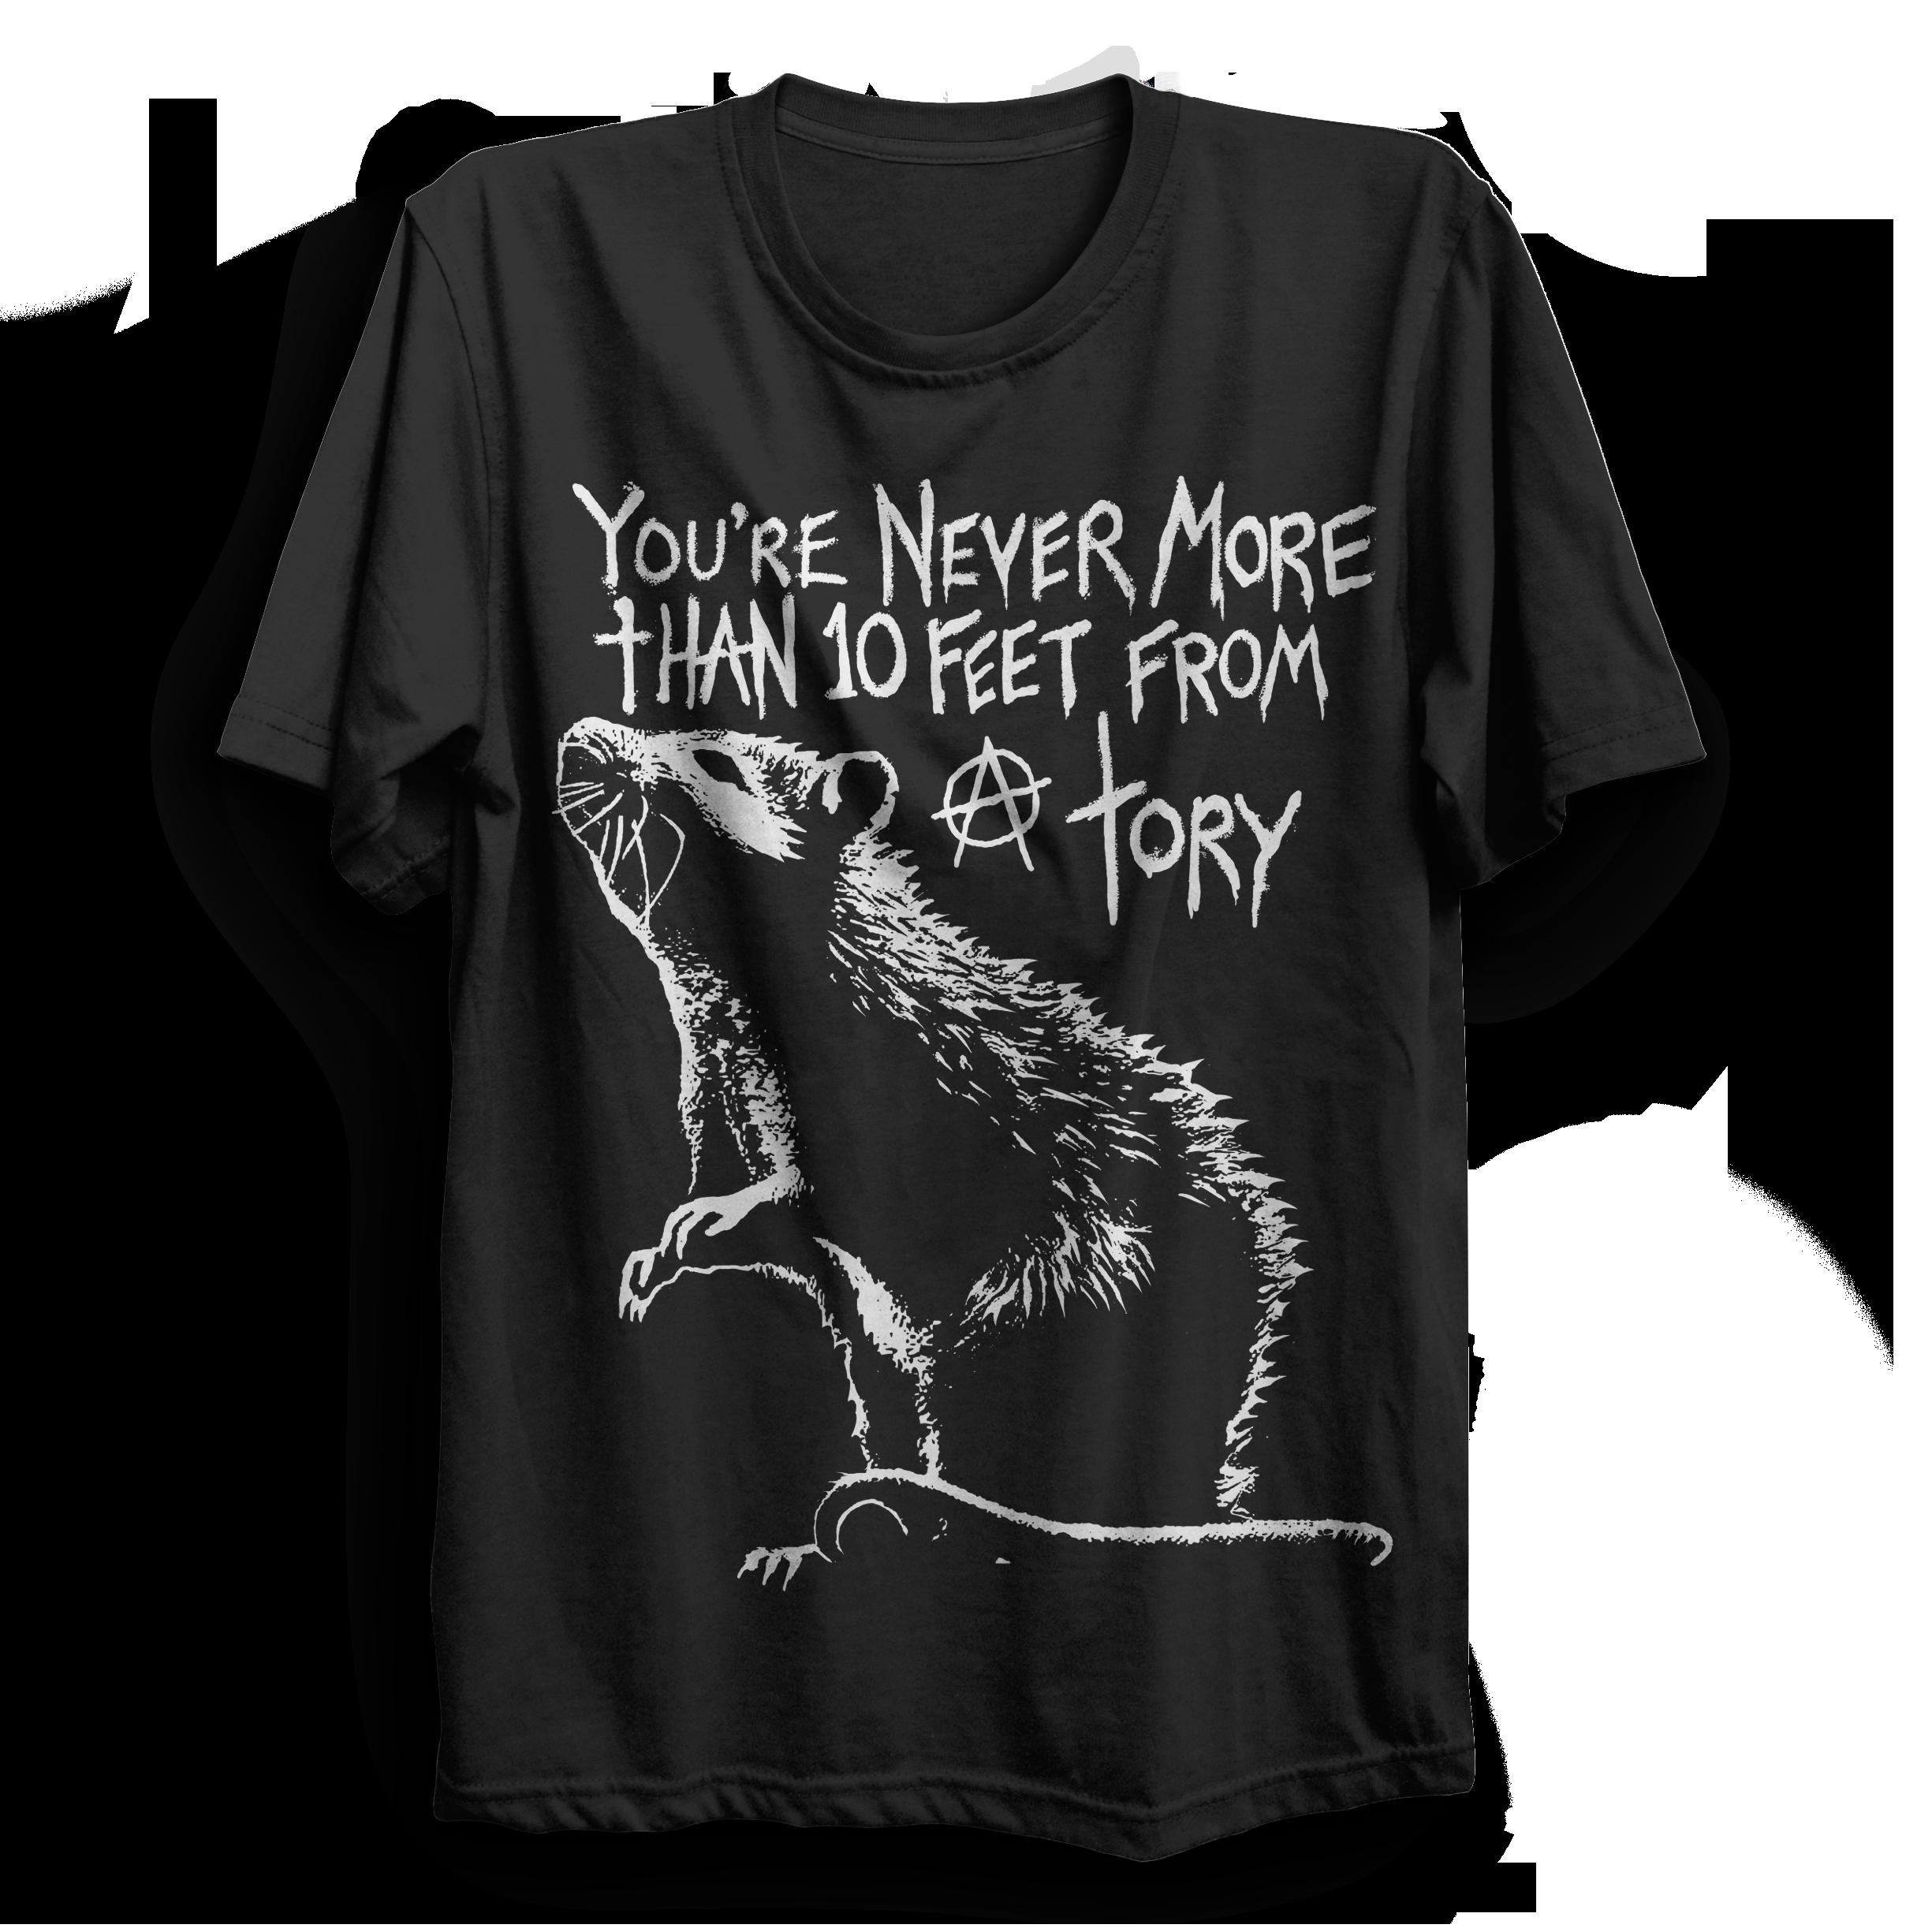 Tory rat t shirt punx uk for T shirts online uk